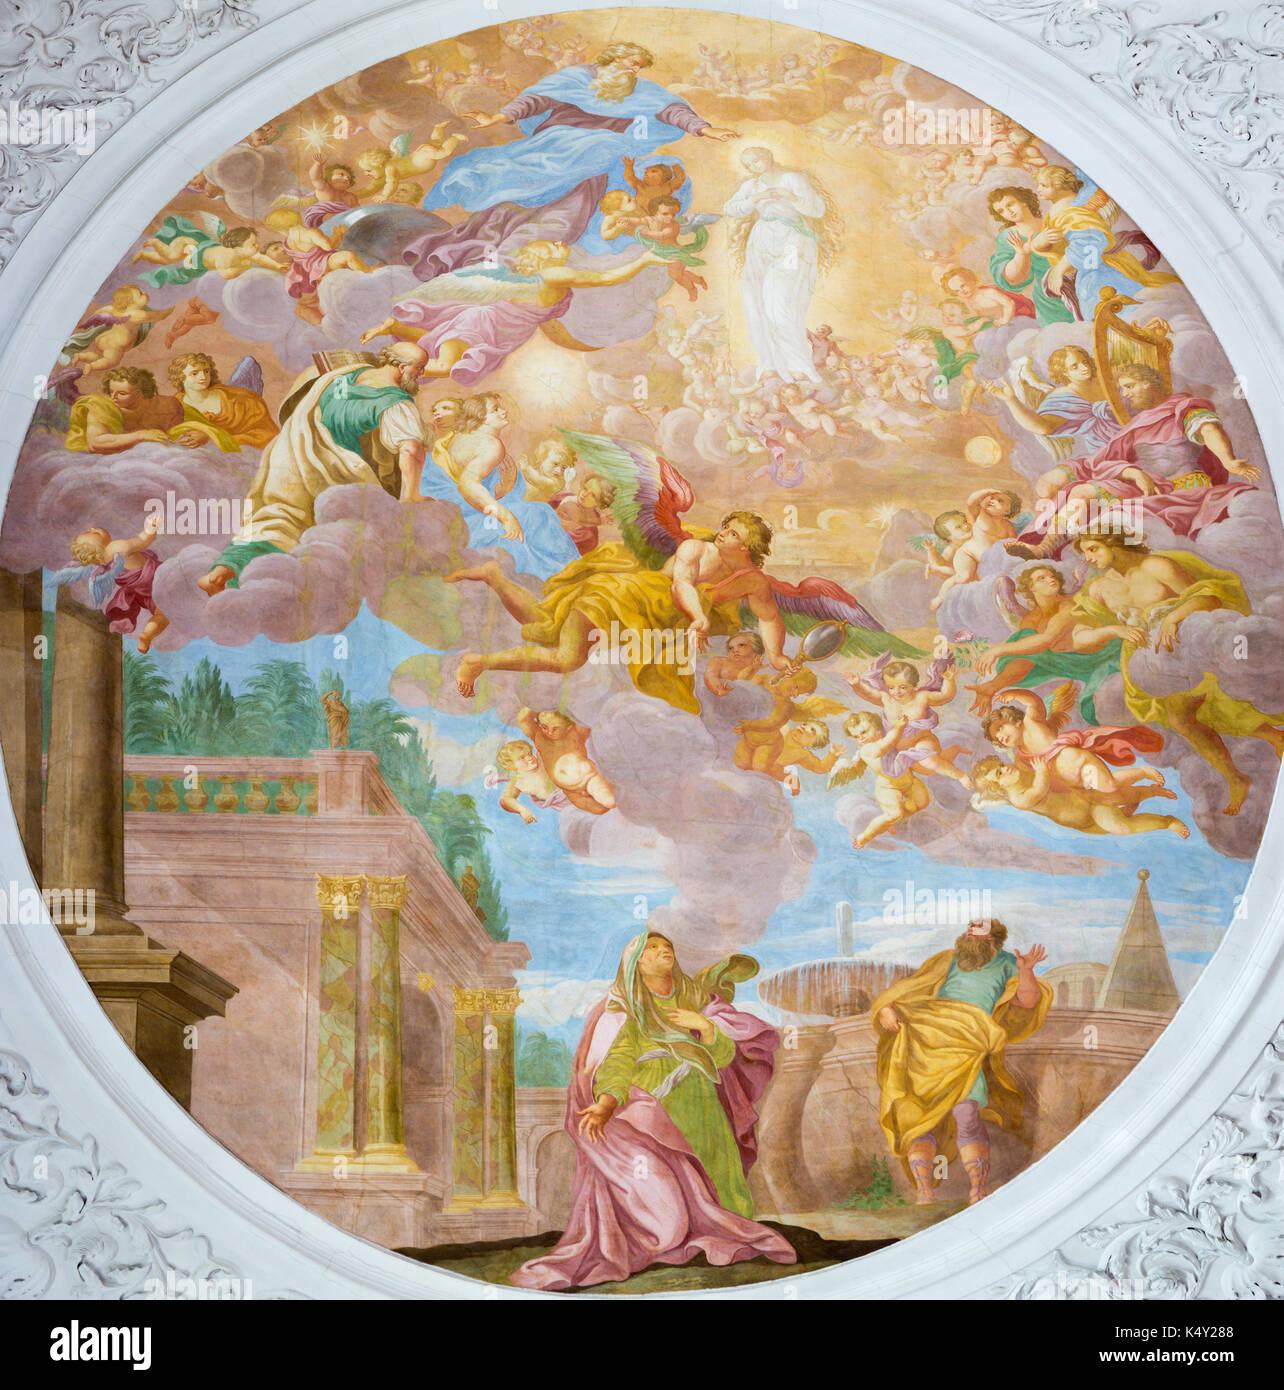 "VIENNA, AUSTRIA - JULY 30, 2014: The fresco of ""Die Erwählung Mariens"" - election of Virgin Mary in church Pfarkirche Maria Hietzing by Antoni Galliar - Stock Image"